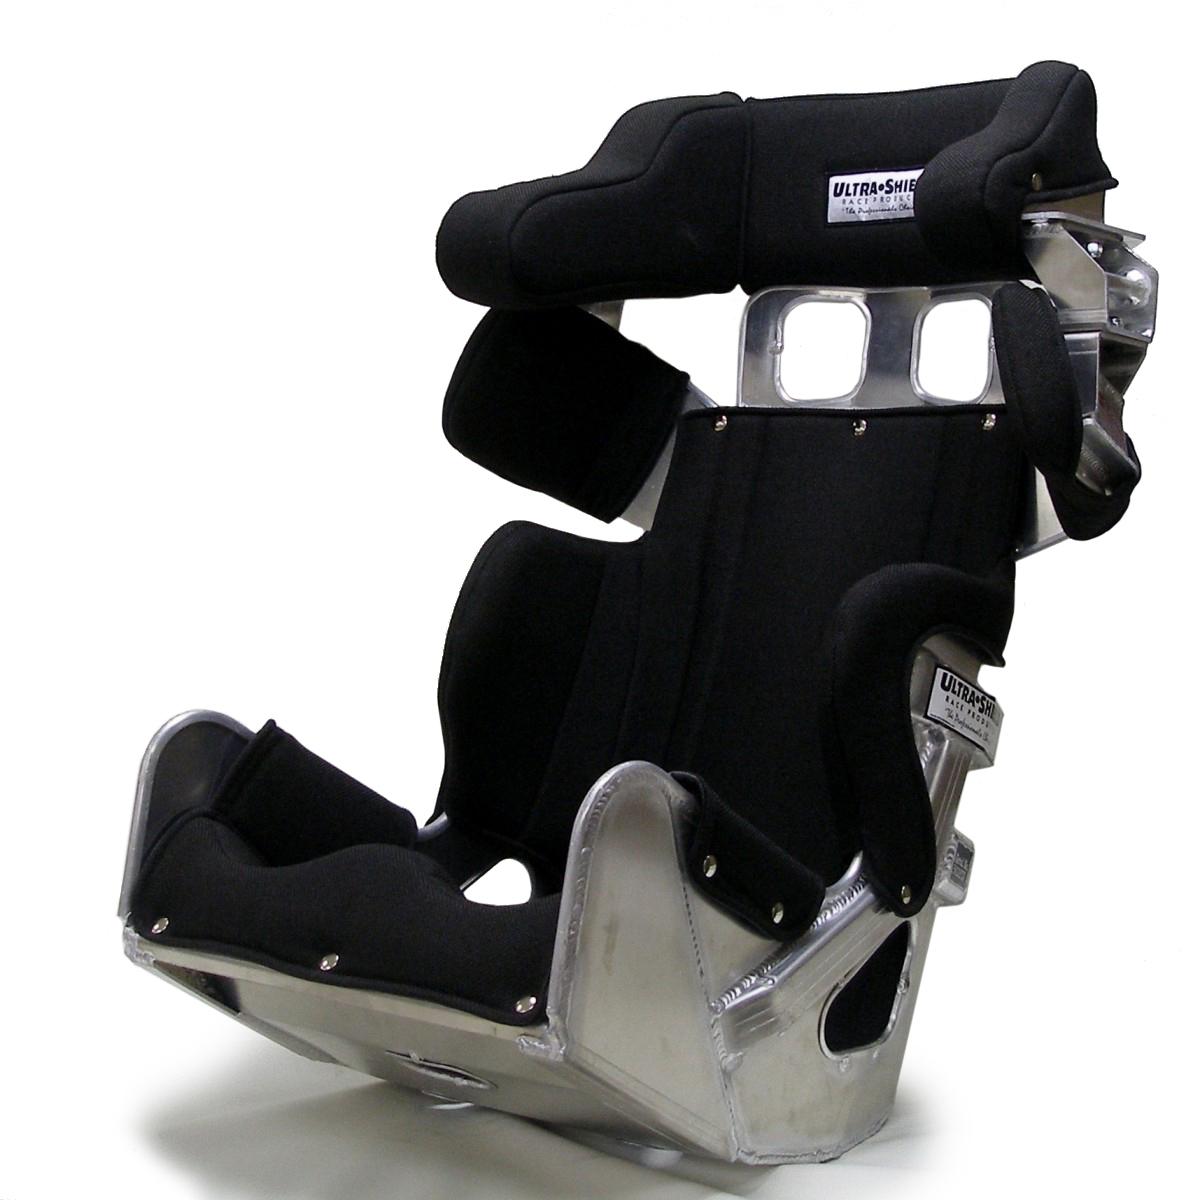 18in Seat W/CVR 20 Deg LM SFI 39.2 Contain